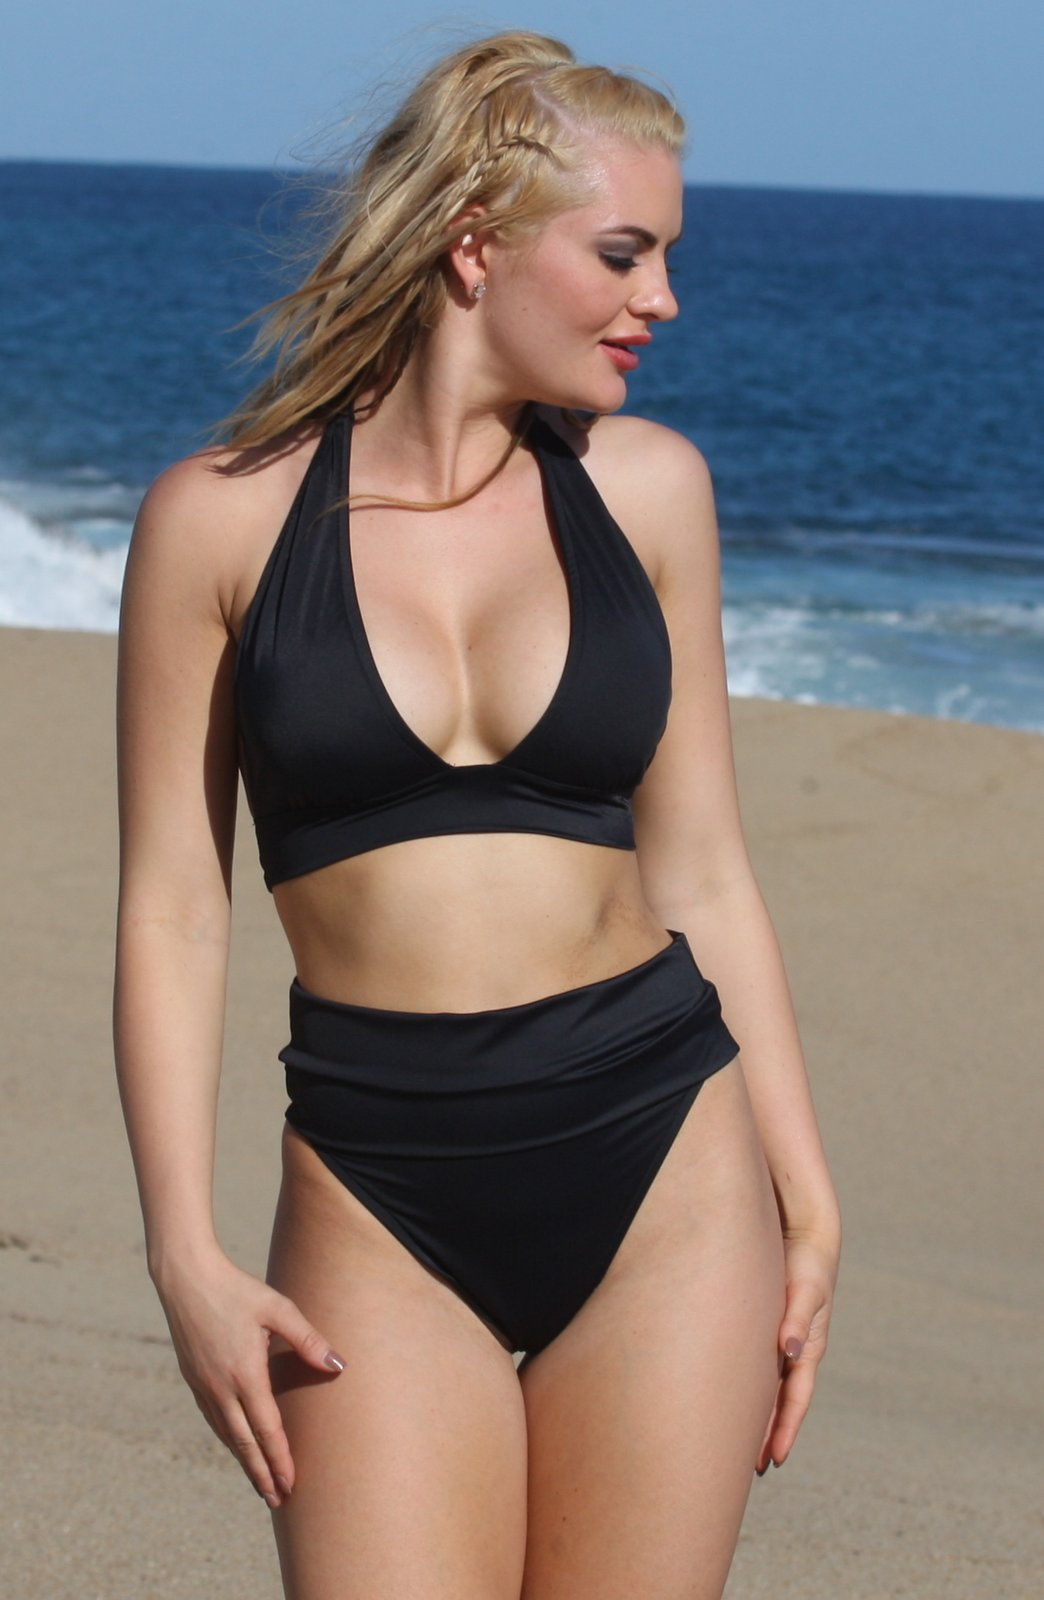 ad95c08f216 Bikini News Daily - Human Barbie Frida Aasennever really thought ...